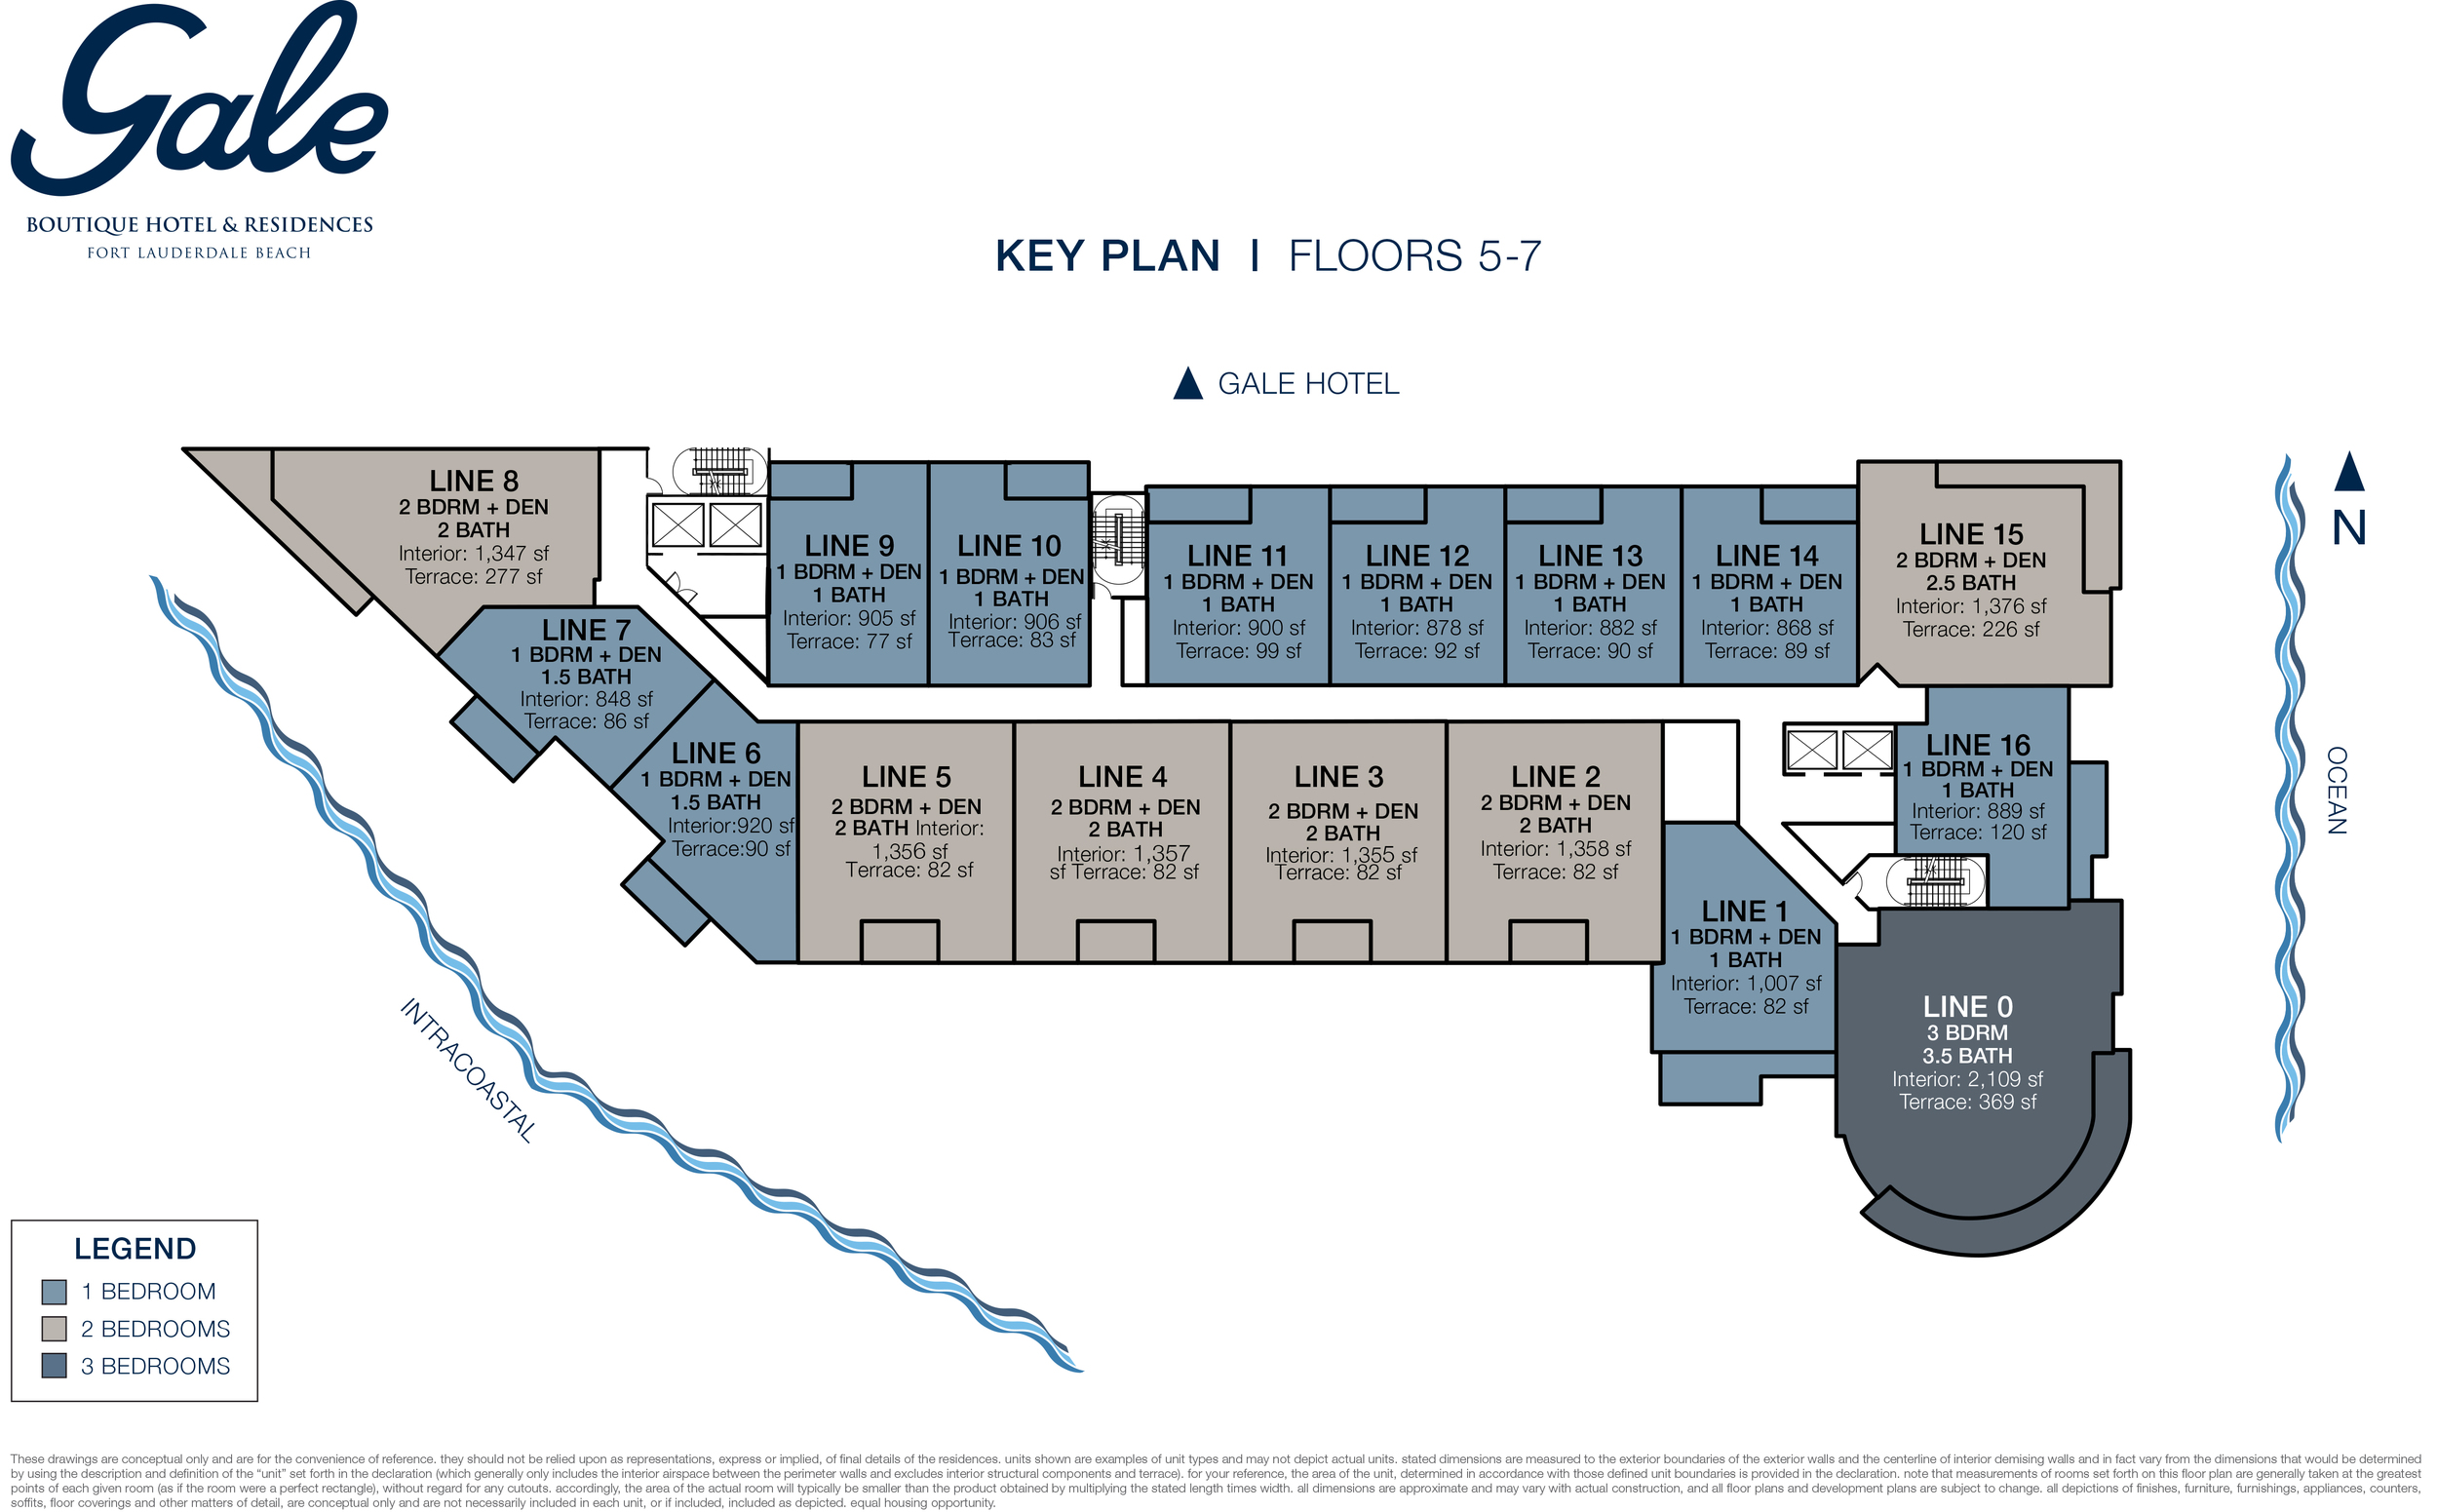 Gale Boutique Hotel & Residences Ft.Lauderdale Floors 5-7 Key Plan